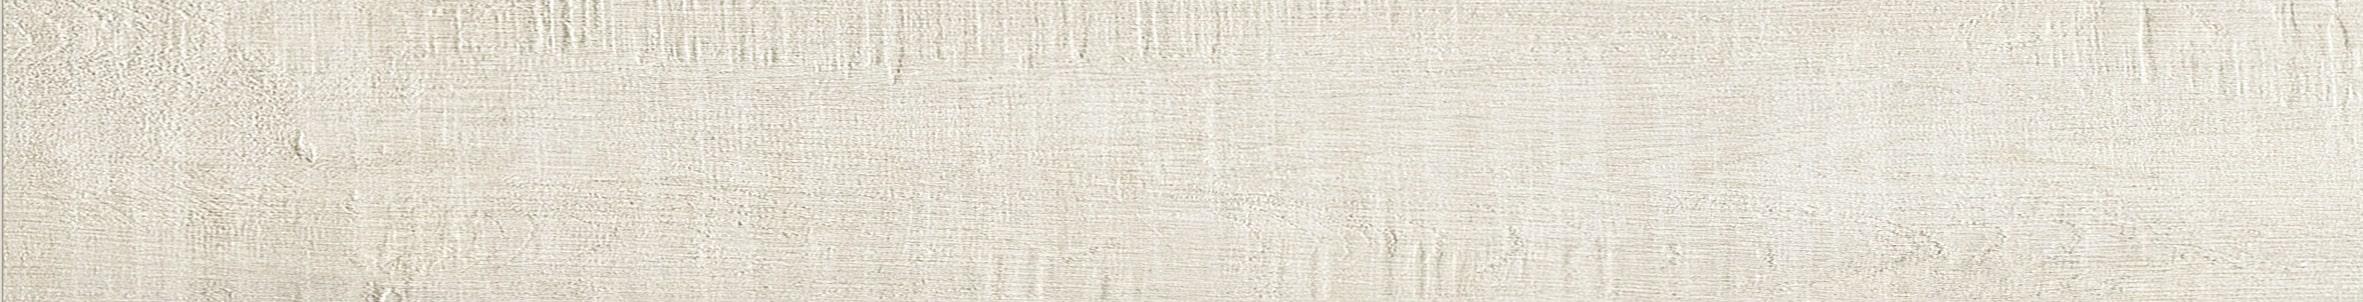 Wooden Tile / Wooden White Matte 10mm 15 x 120